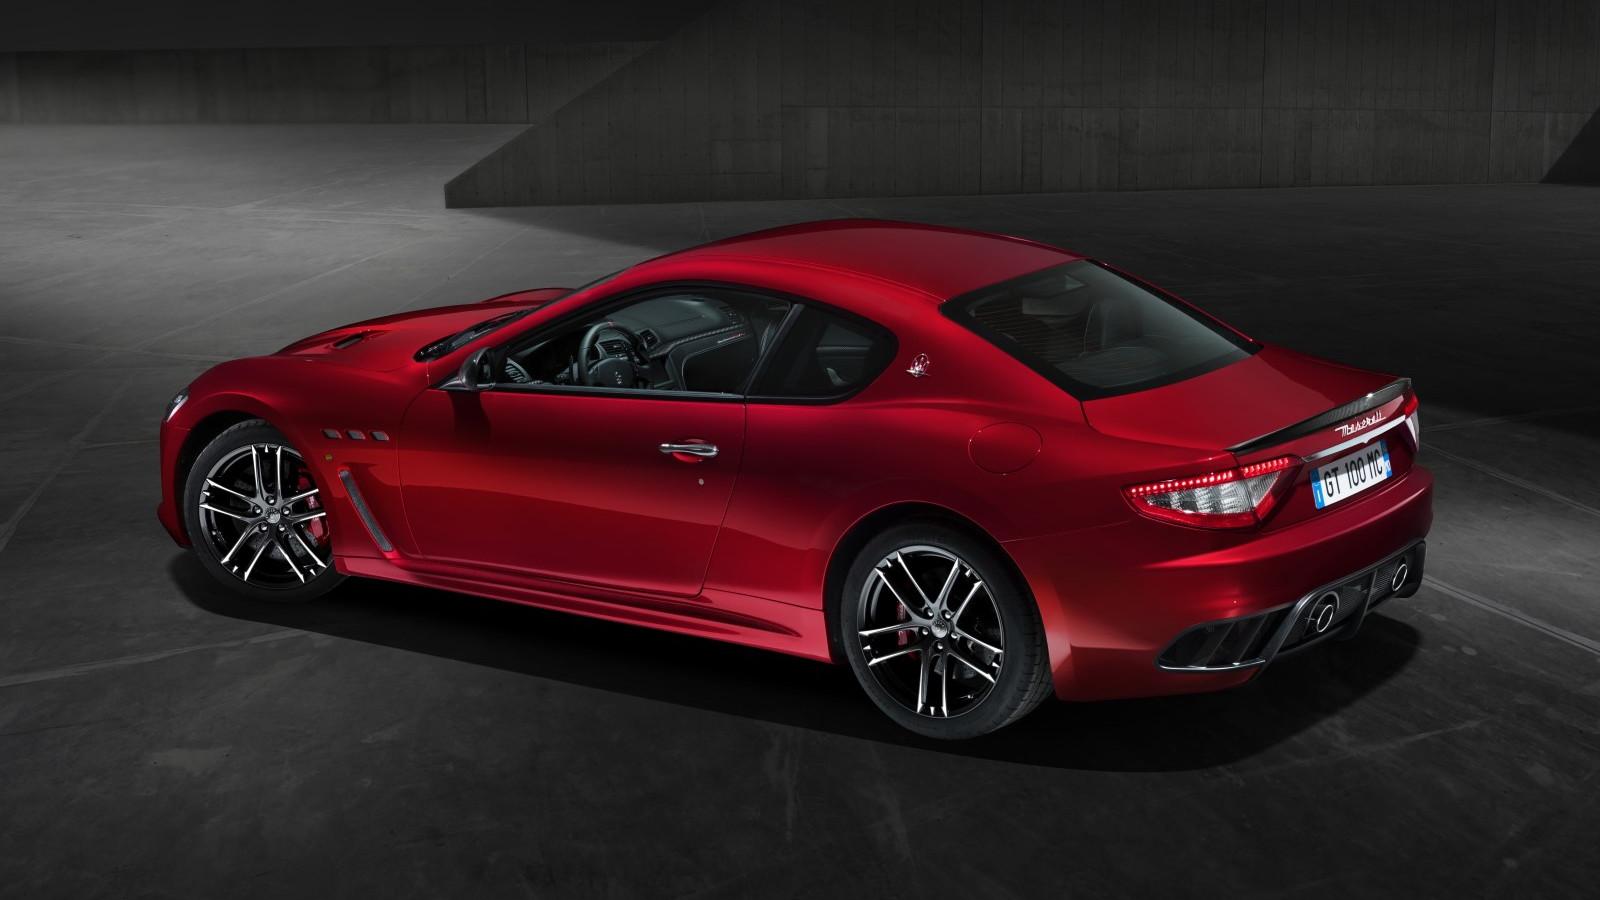 Hertz Auto Sales >> Maserati Centennial Models Debut At 2014 New York Auto Show